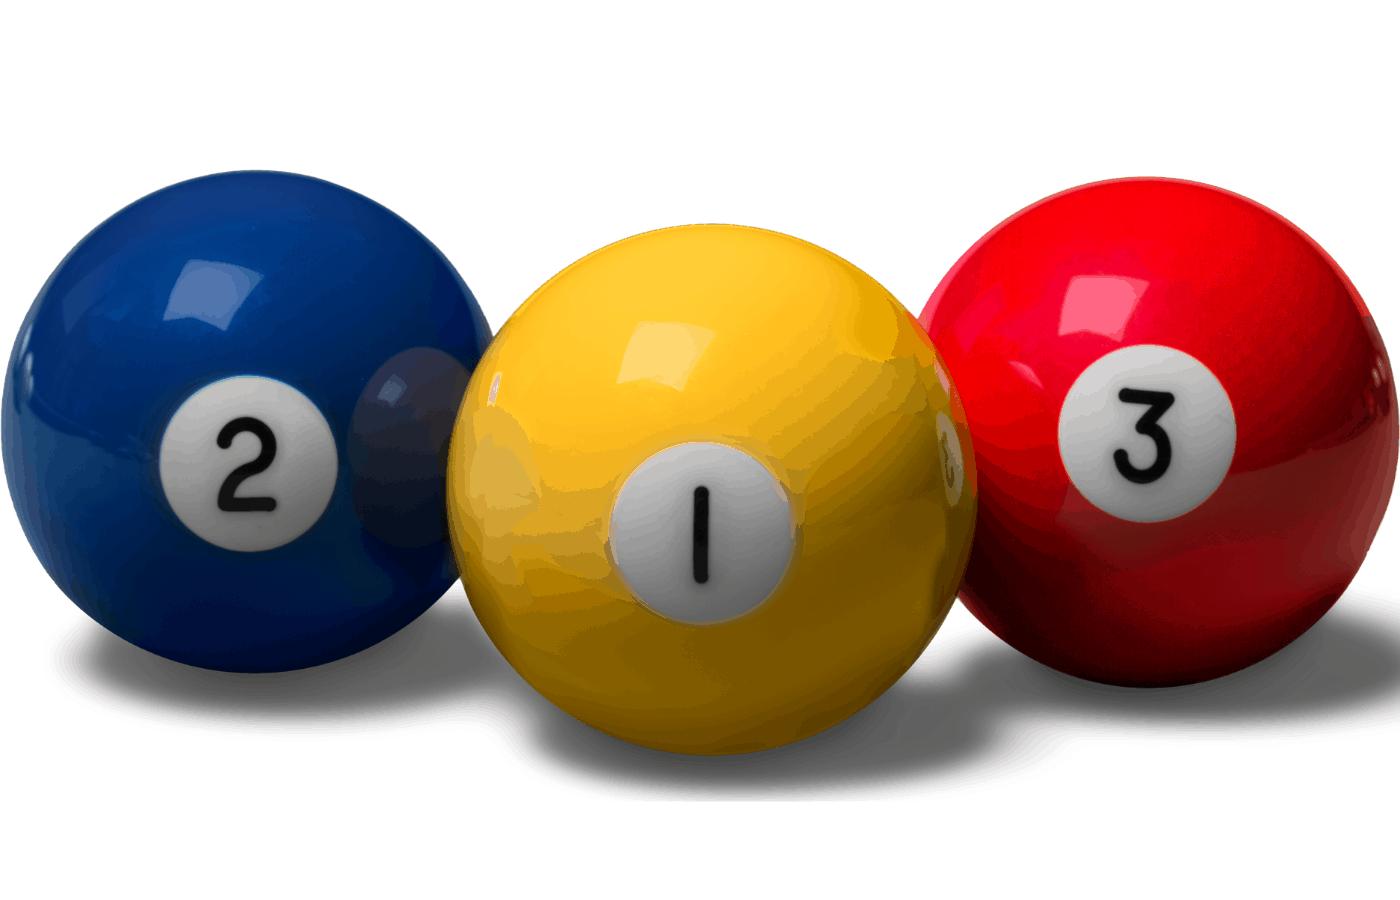 can you paint billiard balls